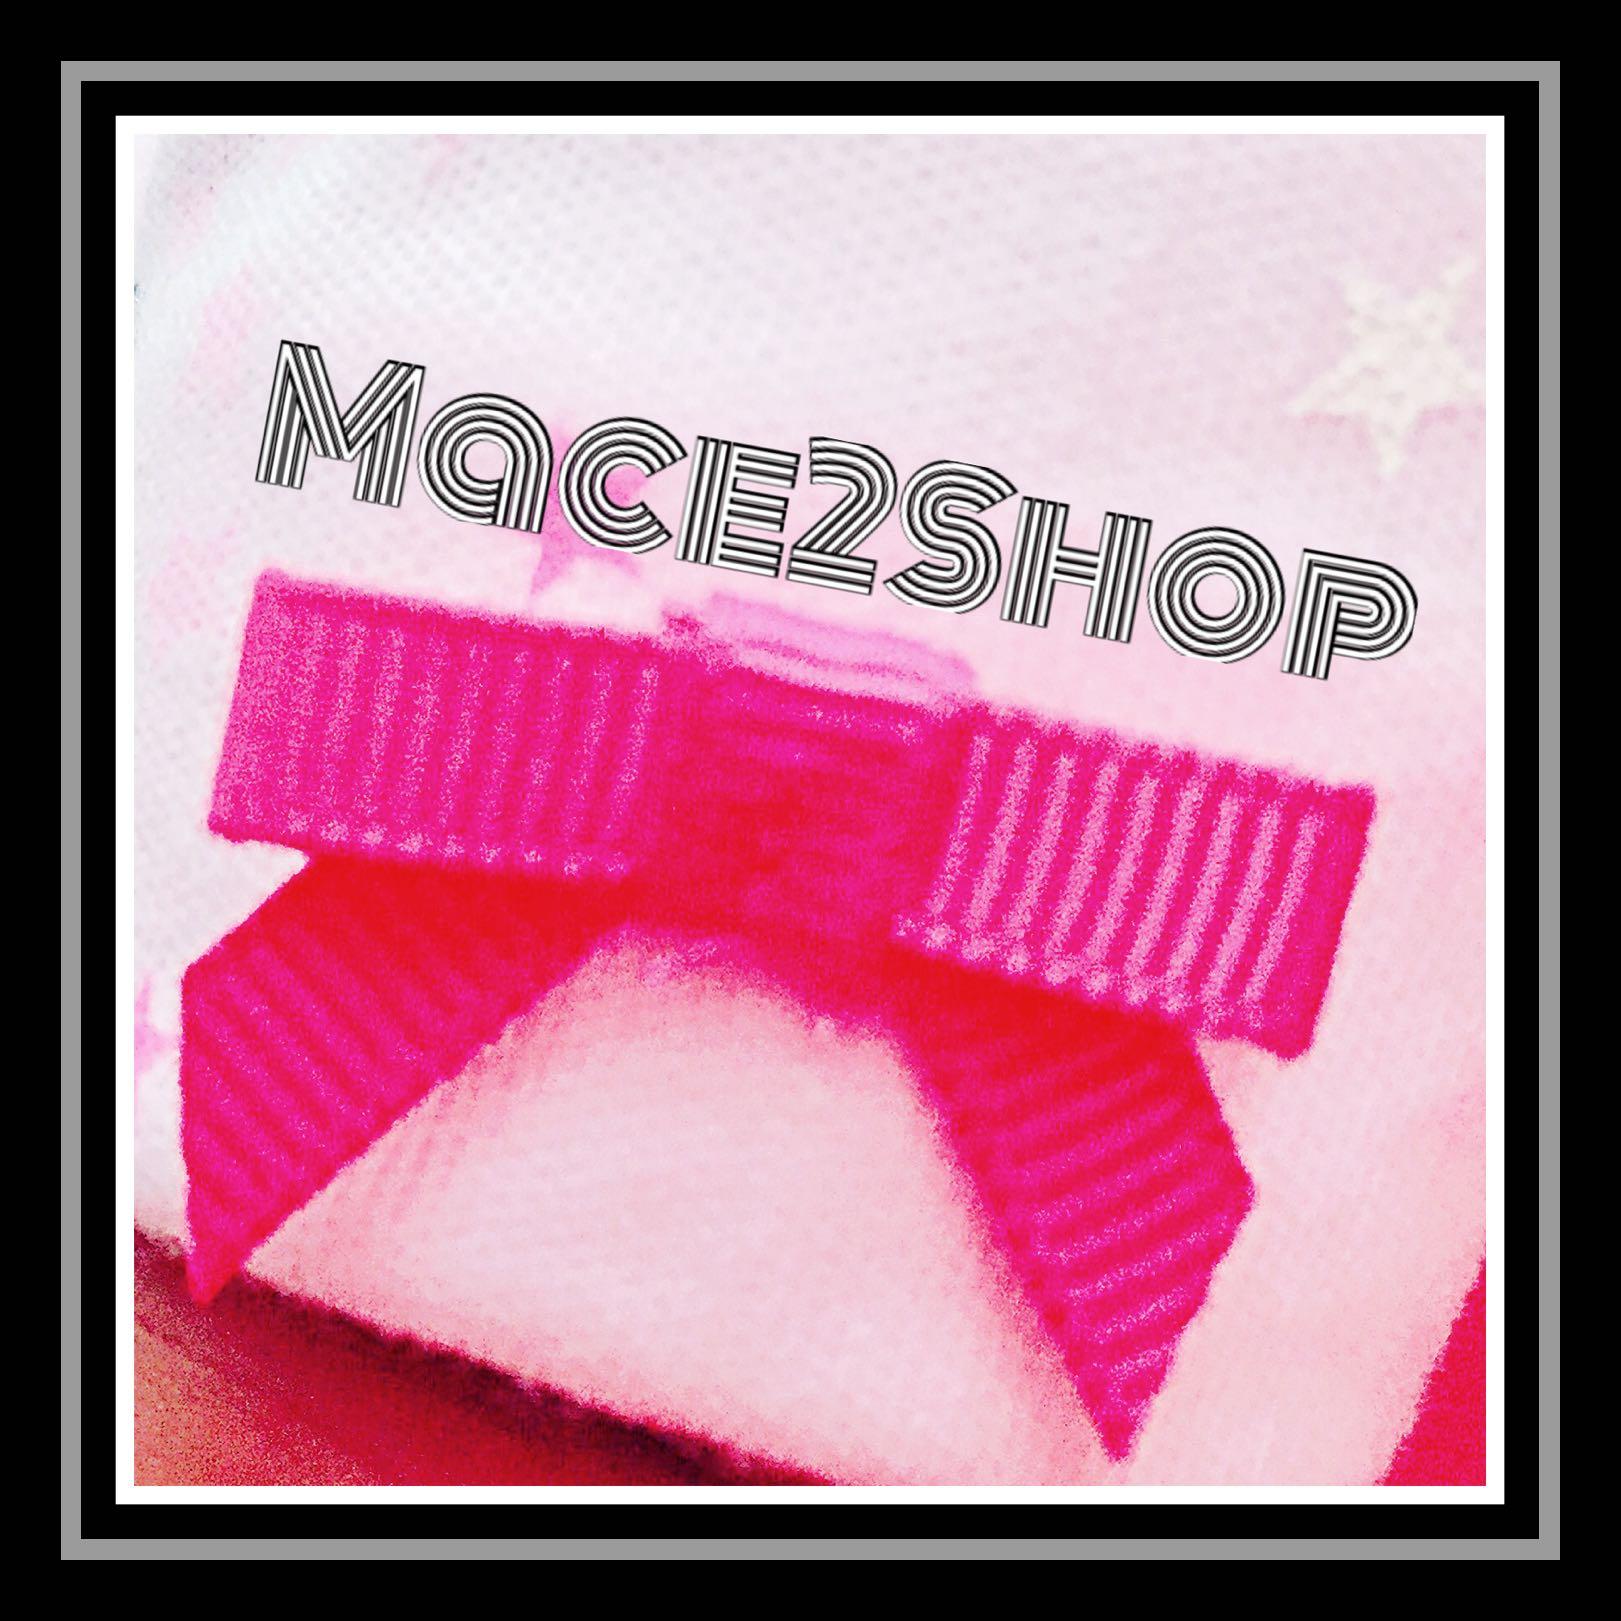 mace2shop